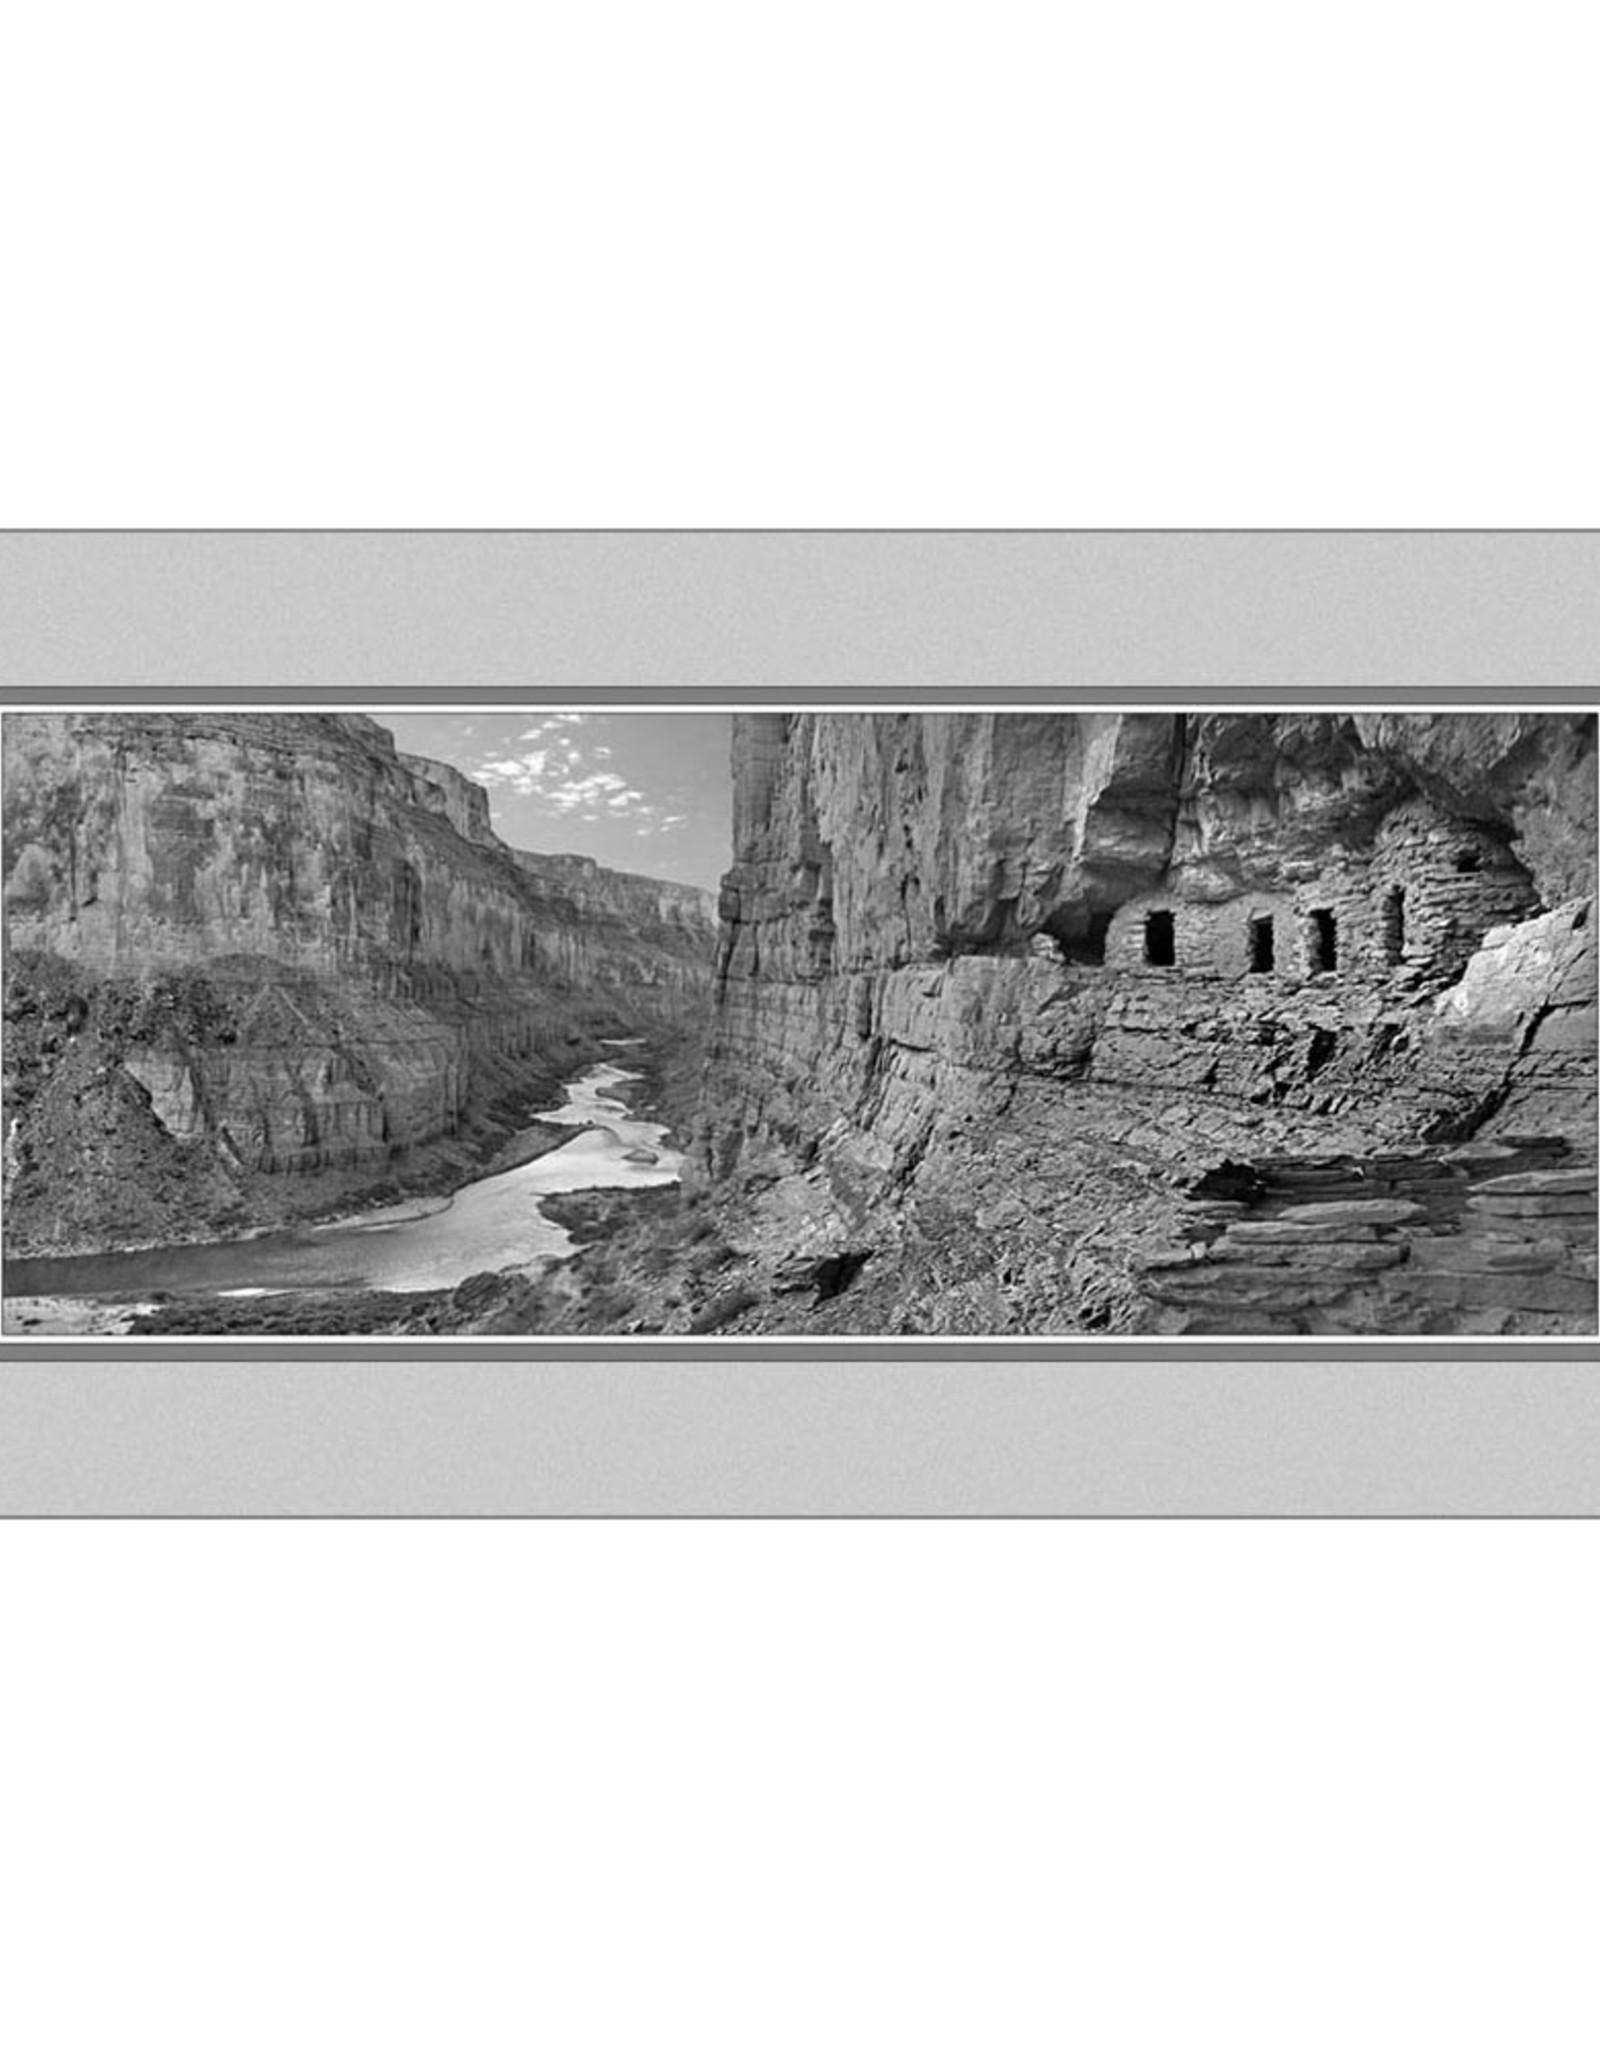 Erskine Wood Nankoweep Granaries, Grand Canyon, Arizona